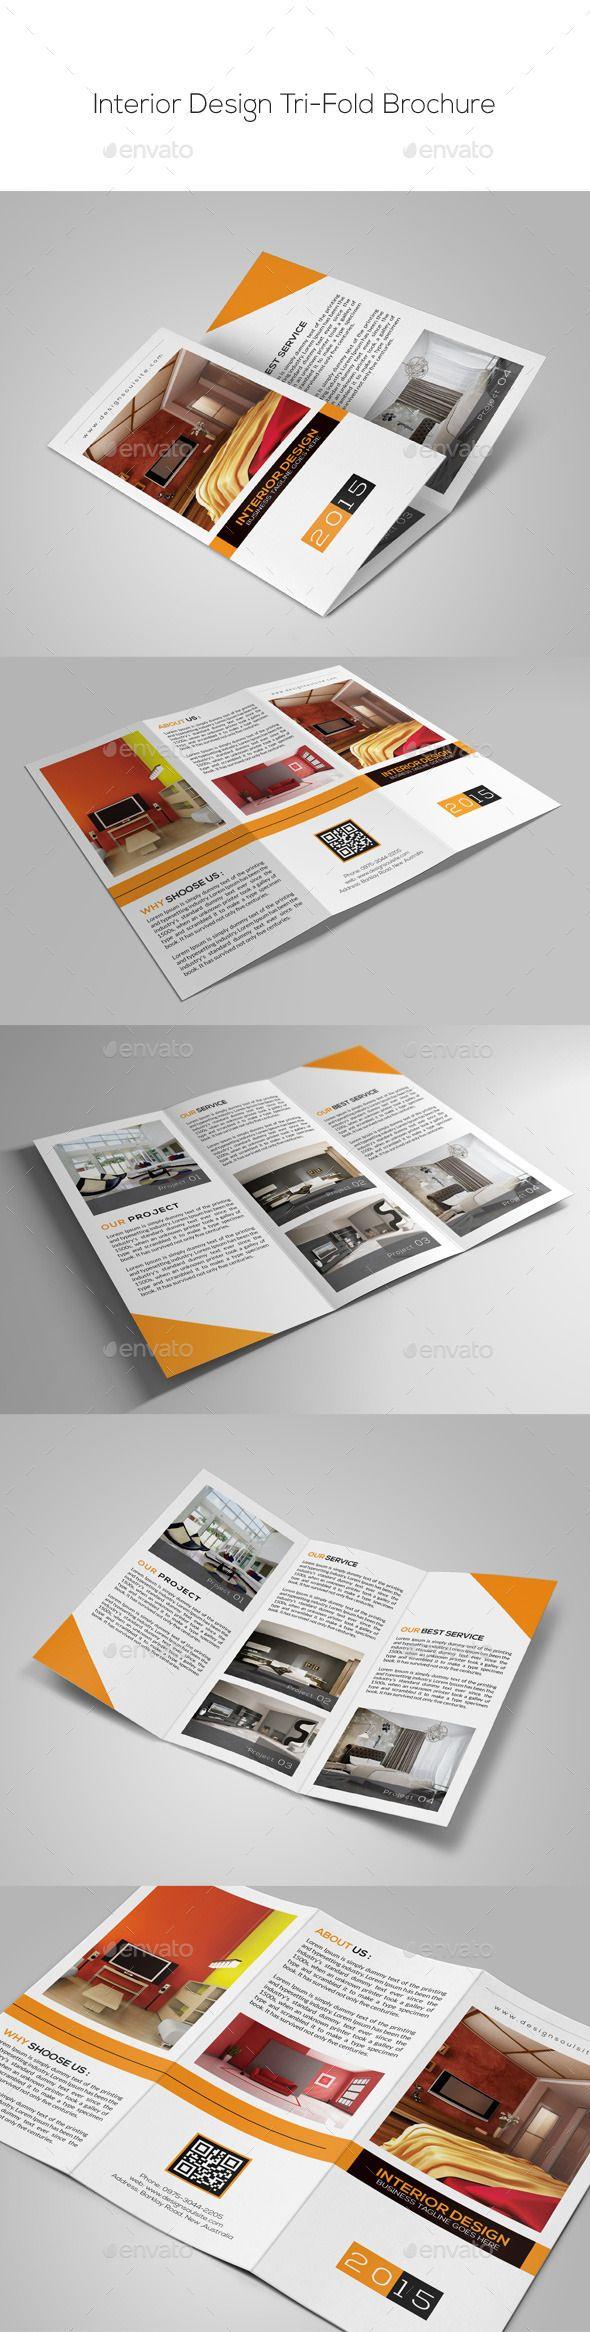 Interior Design Trifold Brochure Template #design Download: http://graphicriver.net/item/interior-design-trifold-brochure-/9855152?ref=ksioks